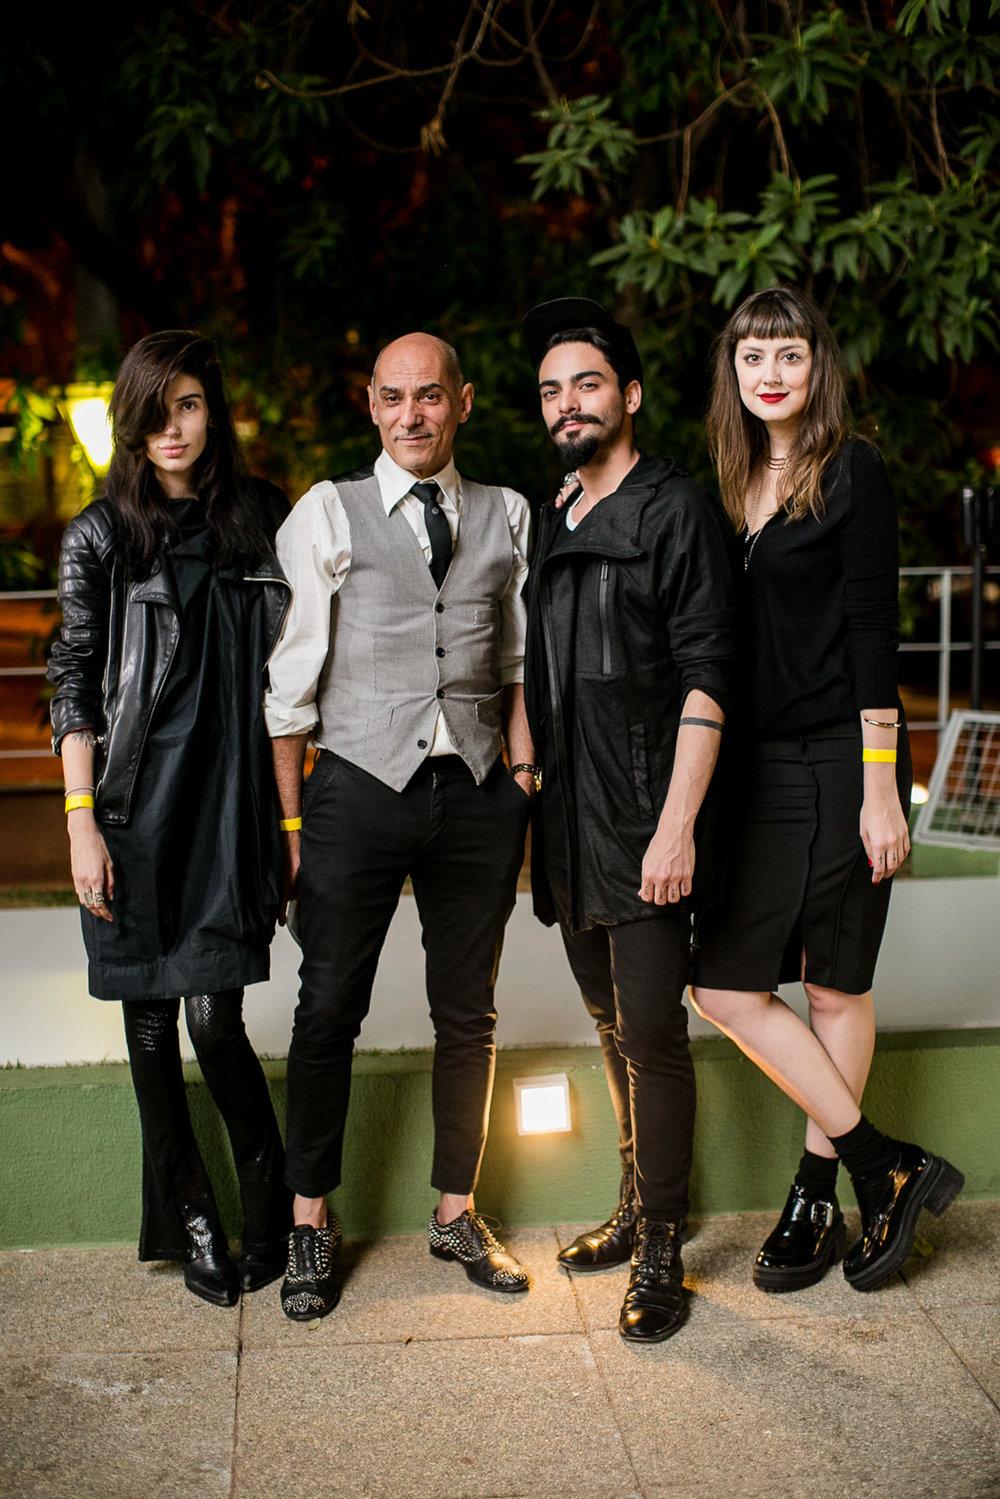 Ana Sofia Meinberg, Zeca Perdigão, Leopoldo Gurgel e Bruna Foureaux - Foto:Barbara Dutra